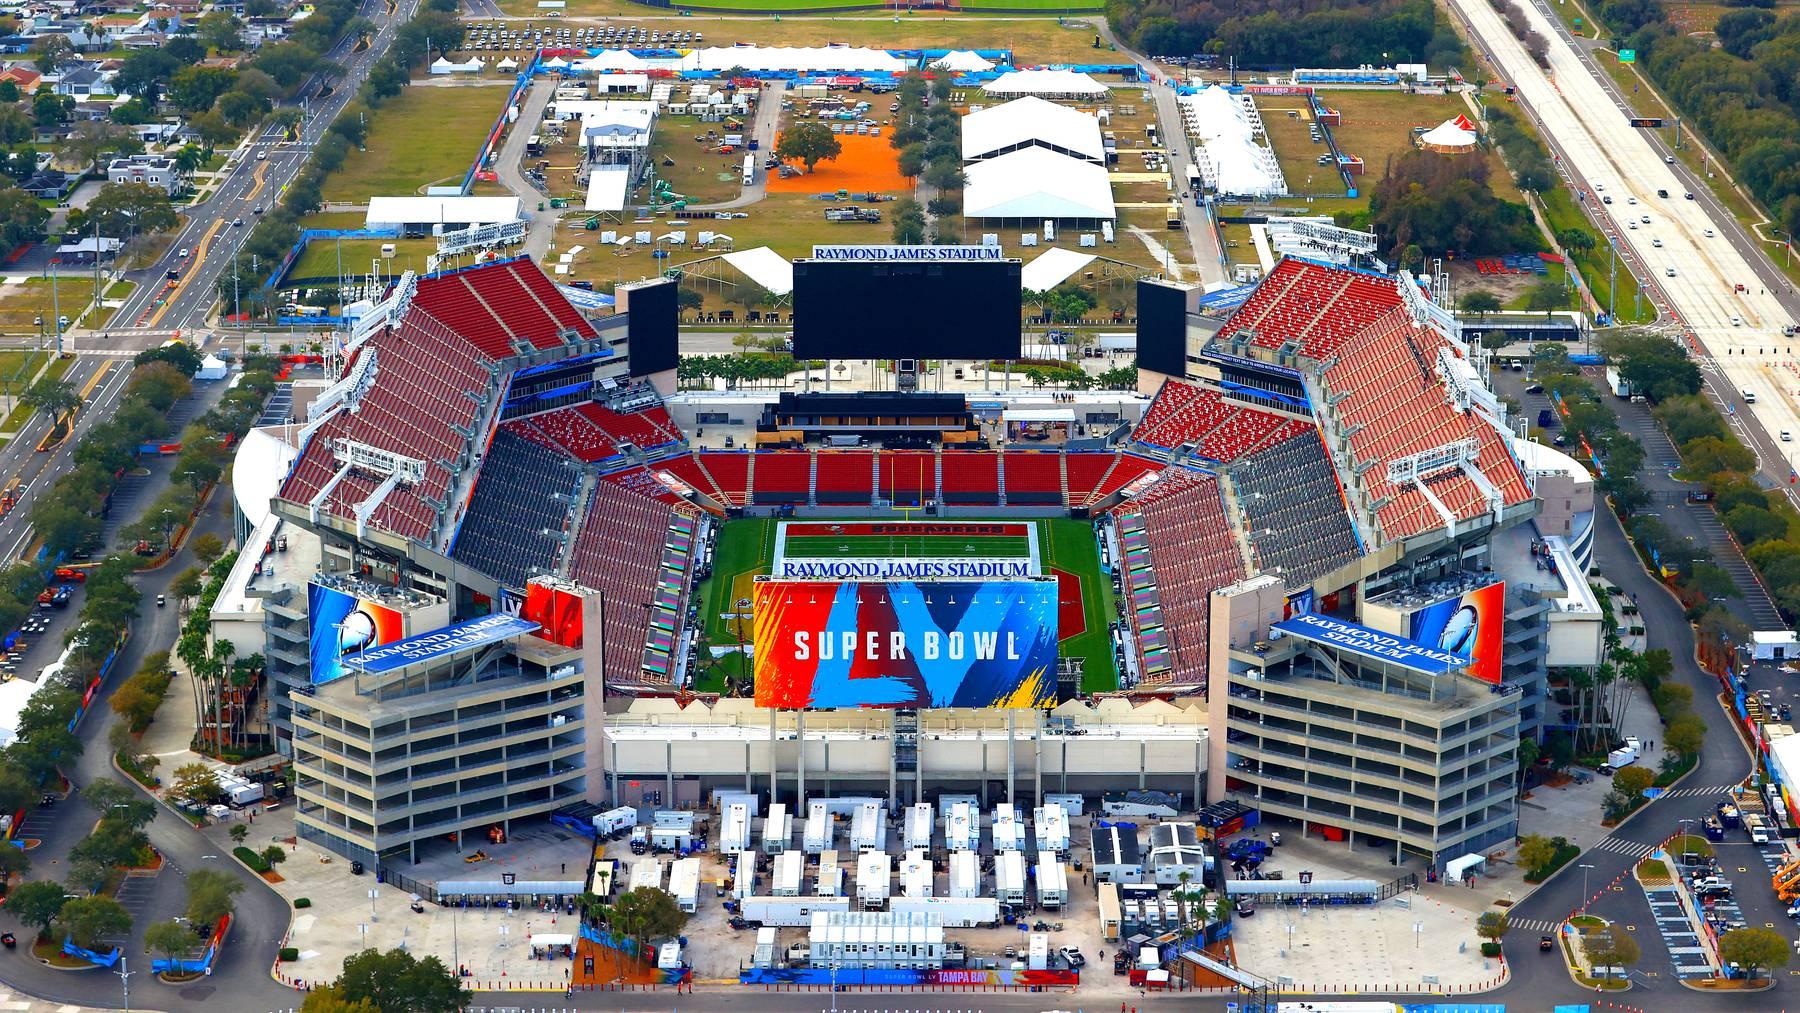 Super Bowl Tampa James Stadion